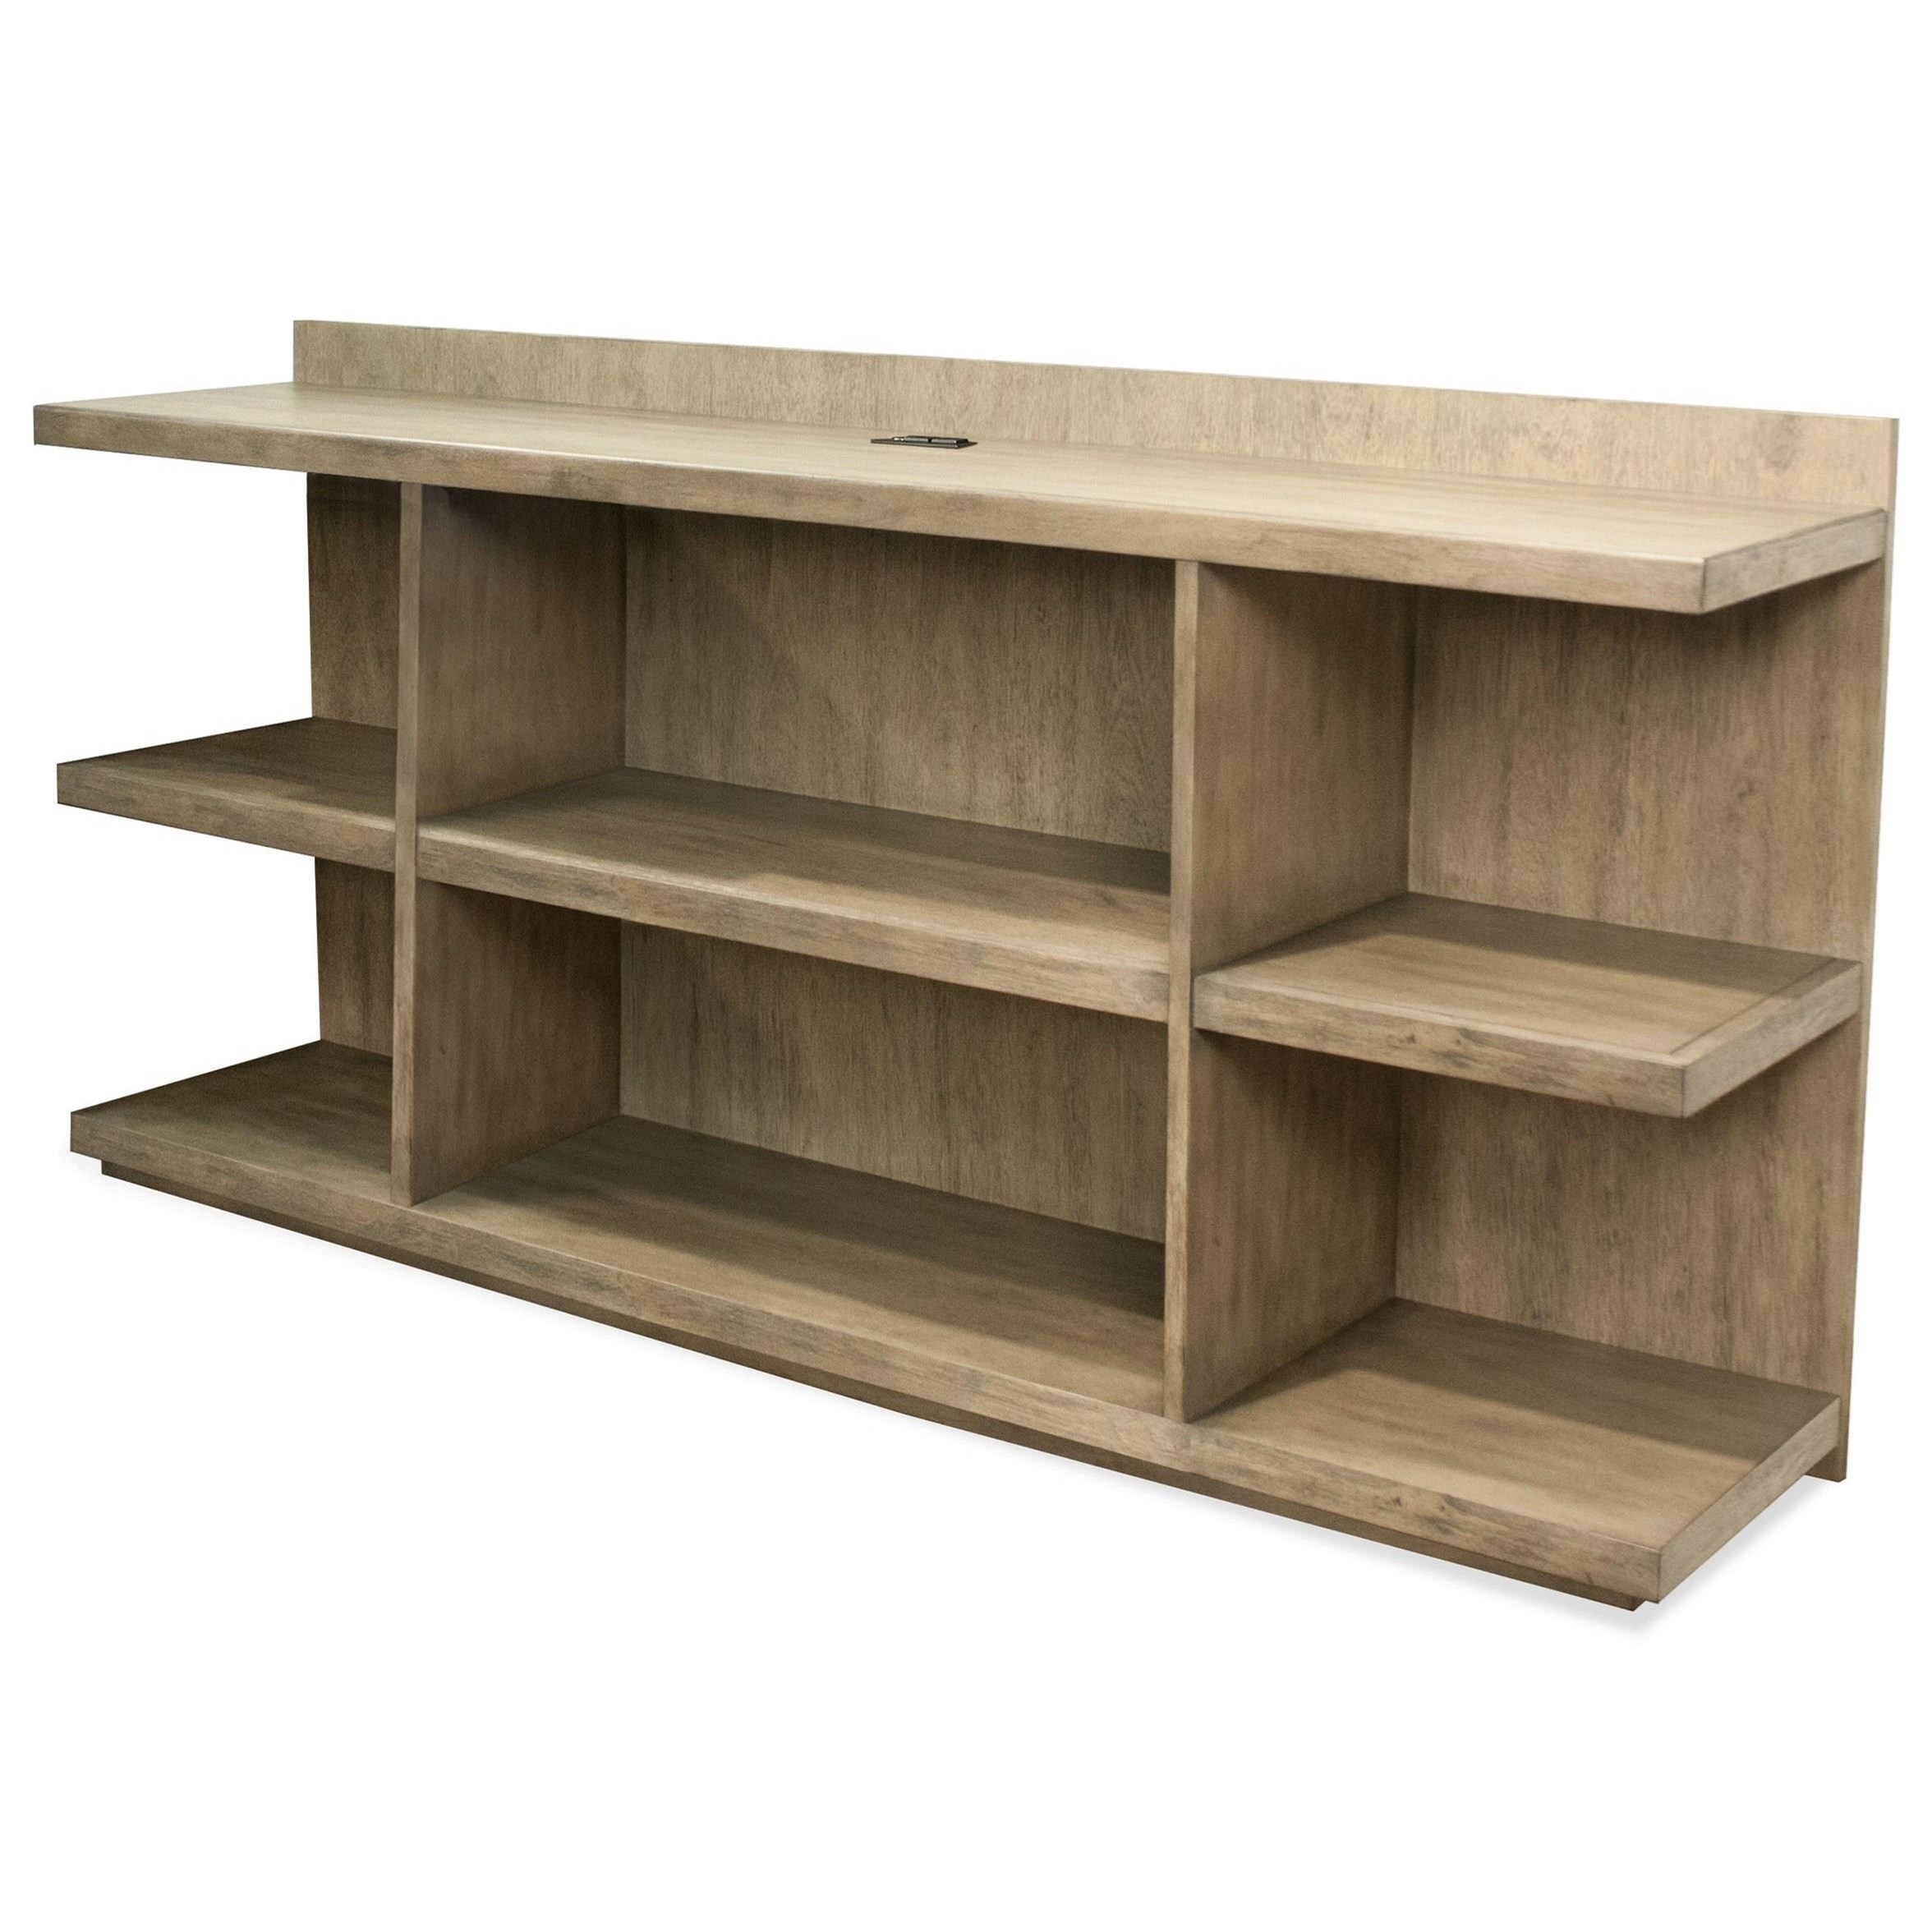 Attractive Riverside Furniture PerspectivesPeninsula Bookcase Desk ...